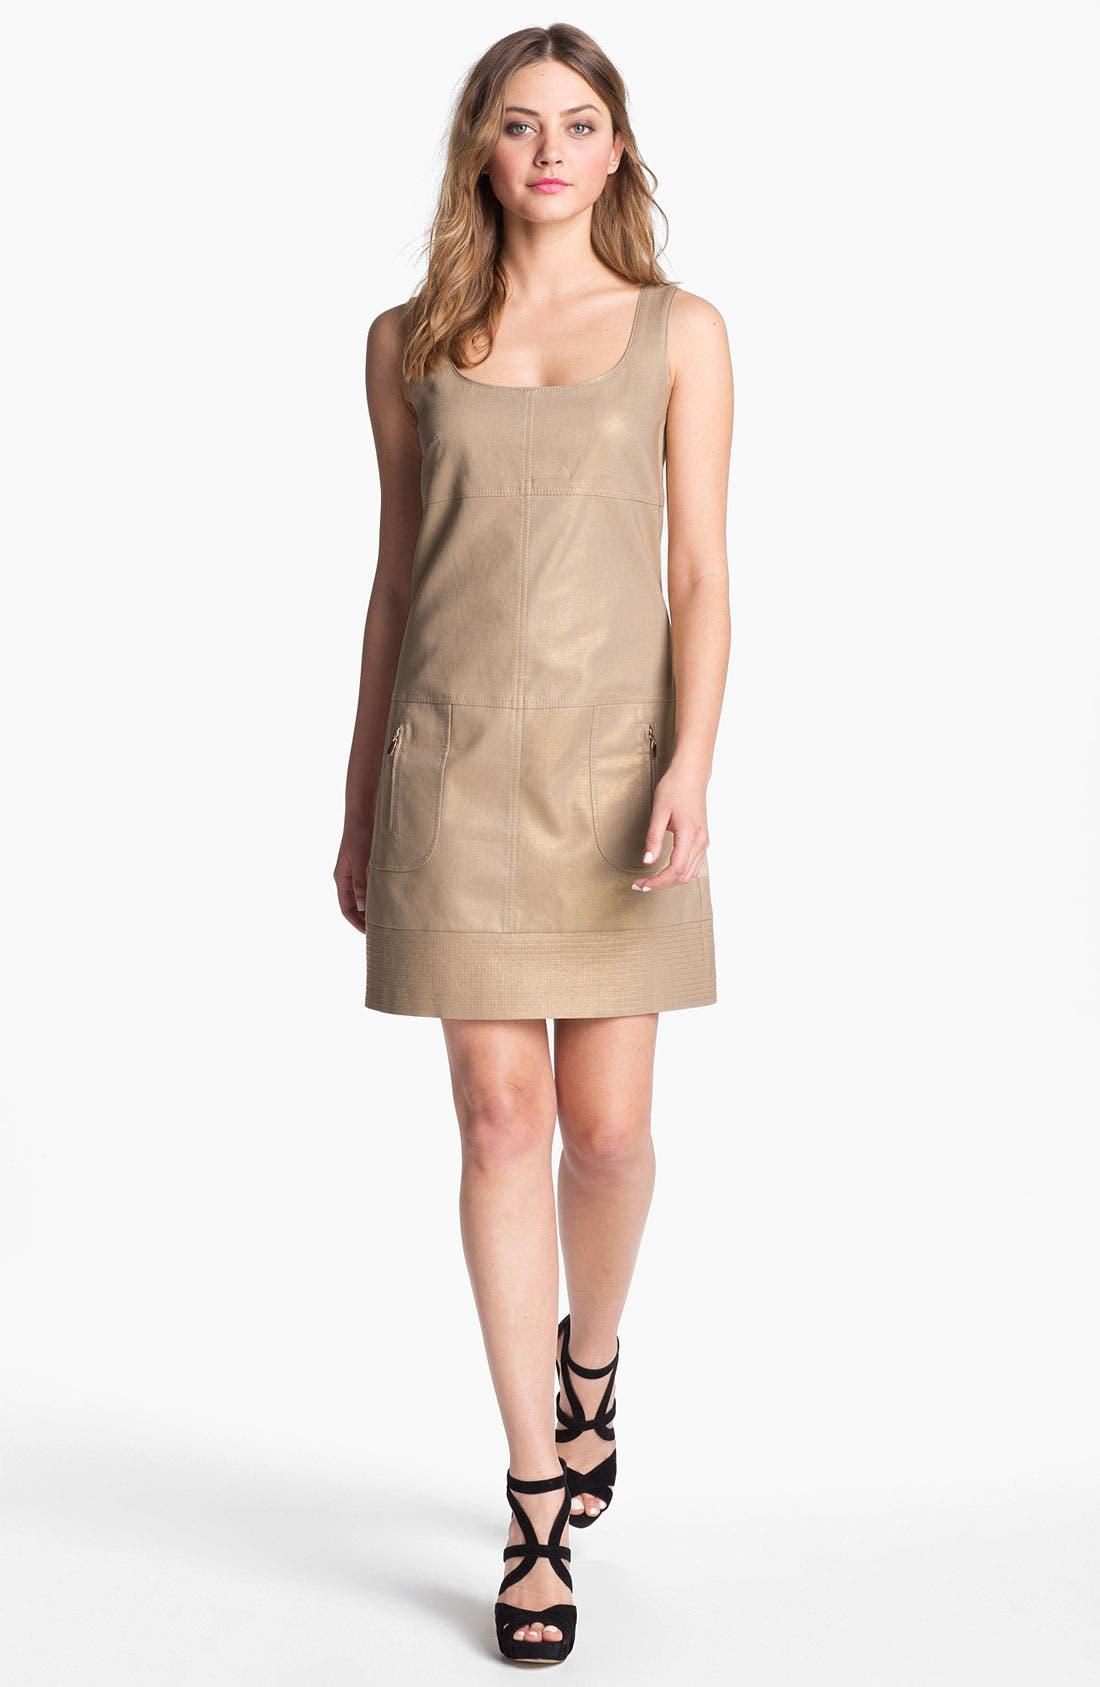 Alternate Image 1 Selected - Laundry by Shelli Segal Metallic Seamed Tank Dress